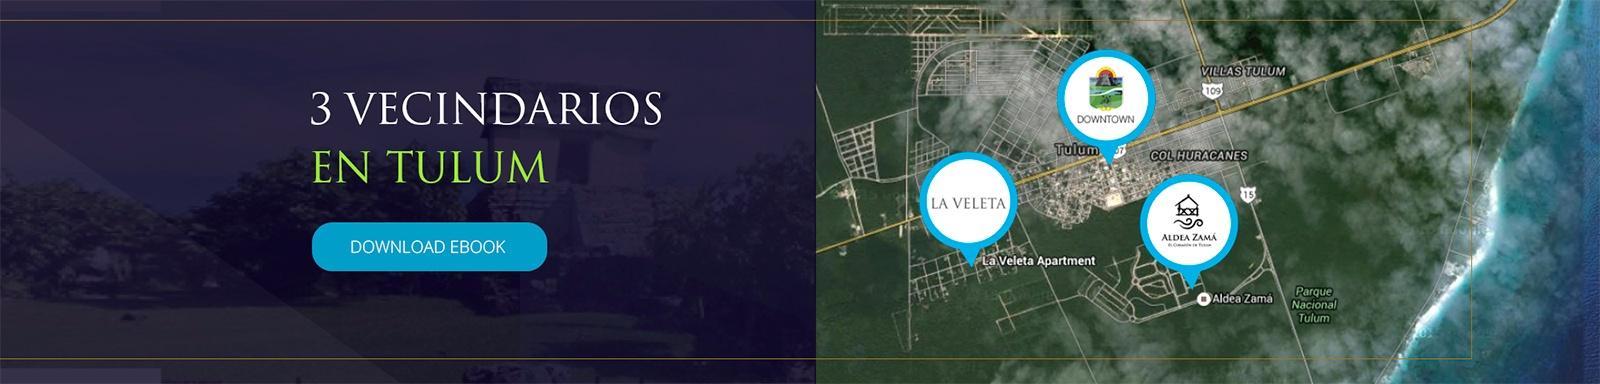 3 vecindarios de Tulum